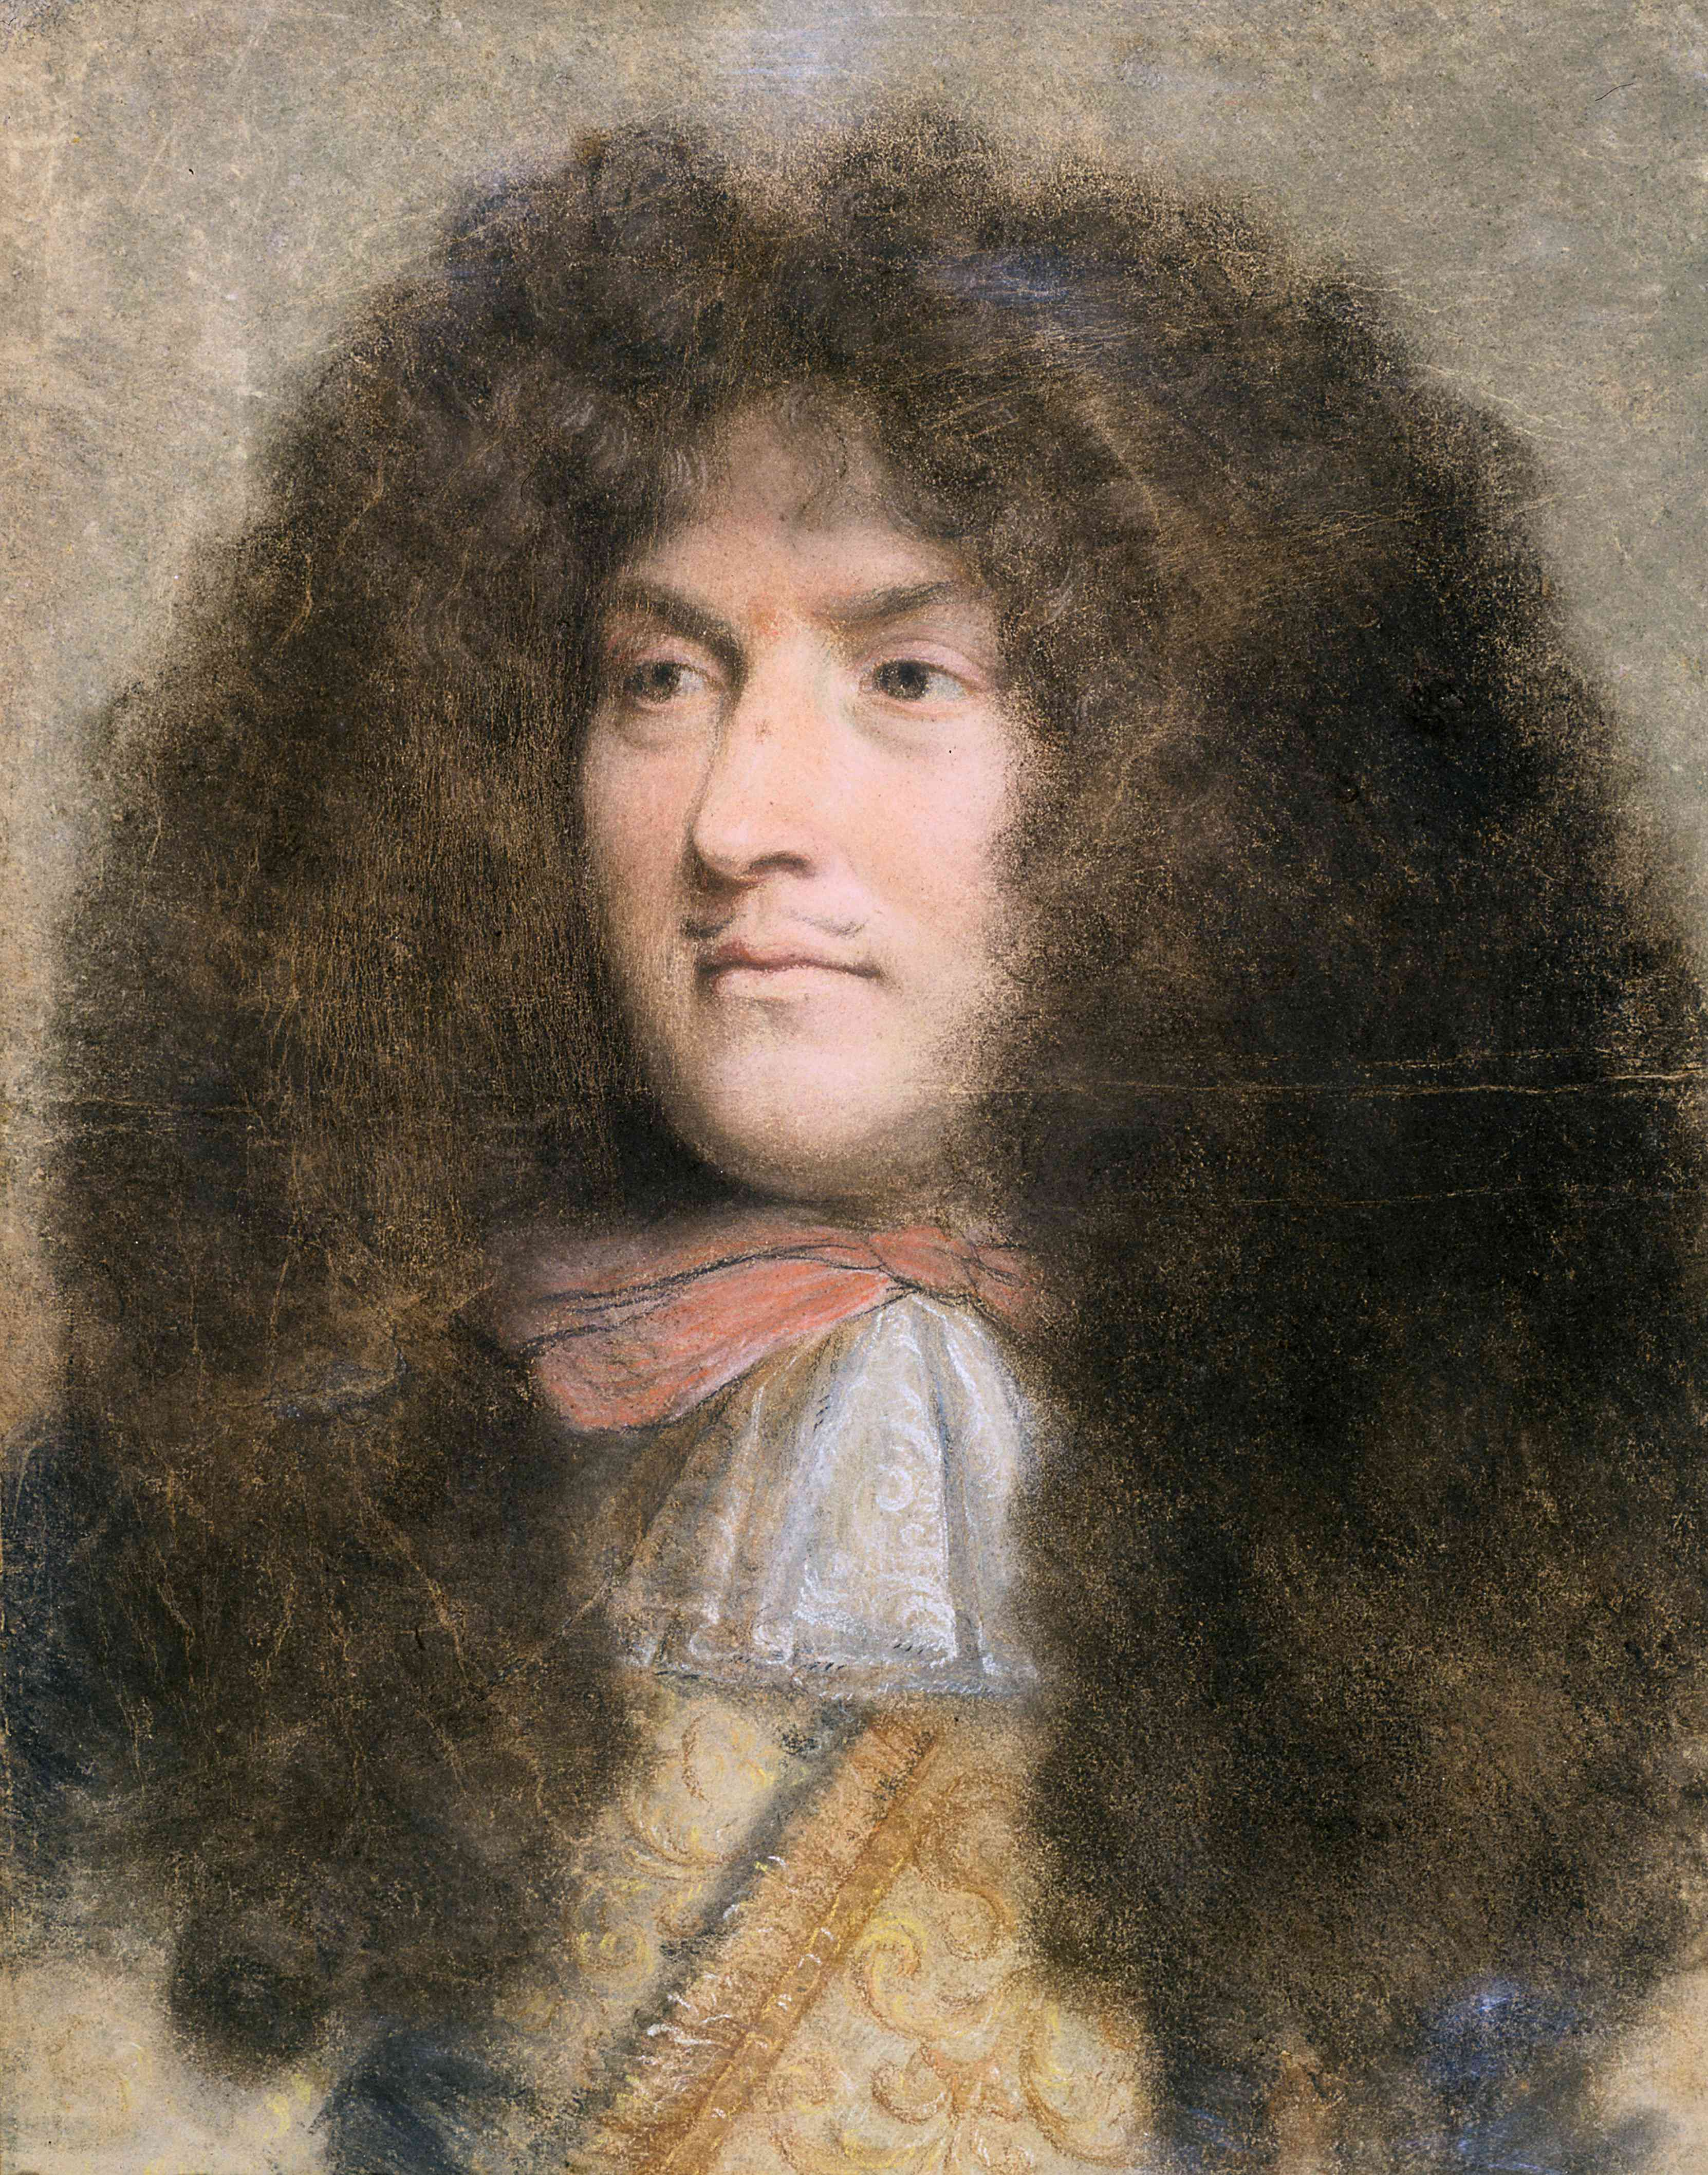 Louis XIV, King of France. Artist: Charles le Brun